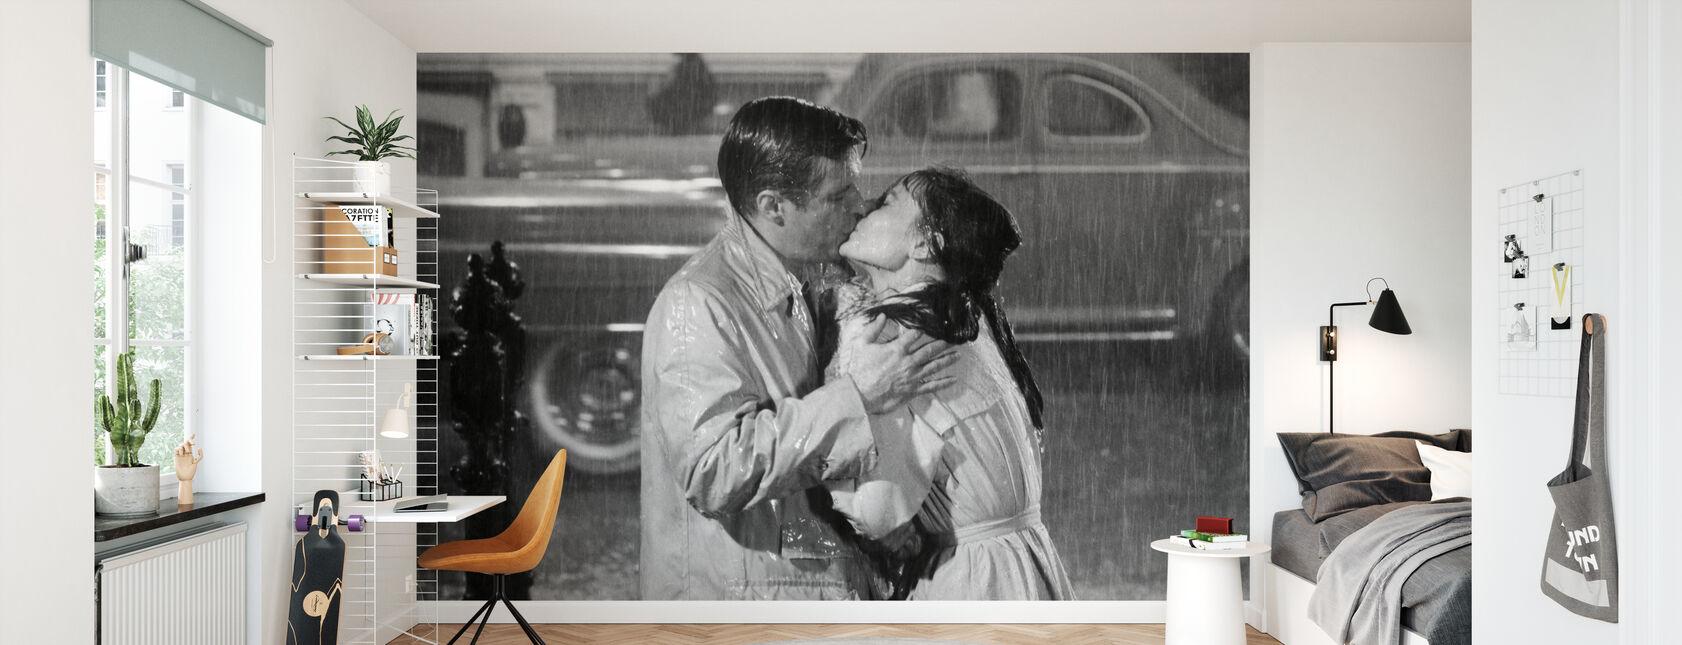 Audrey Hepburn and George Peppard in Breakfast at Tiffanys - Wallpaper - Kids Room